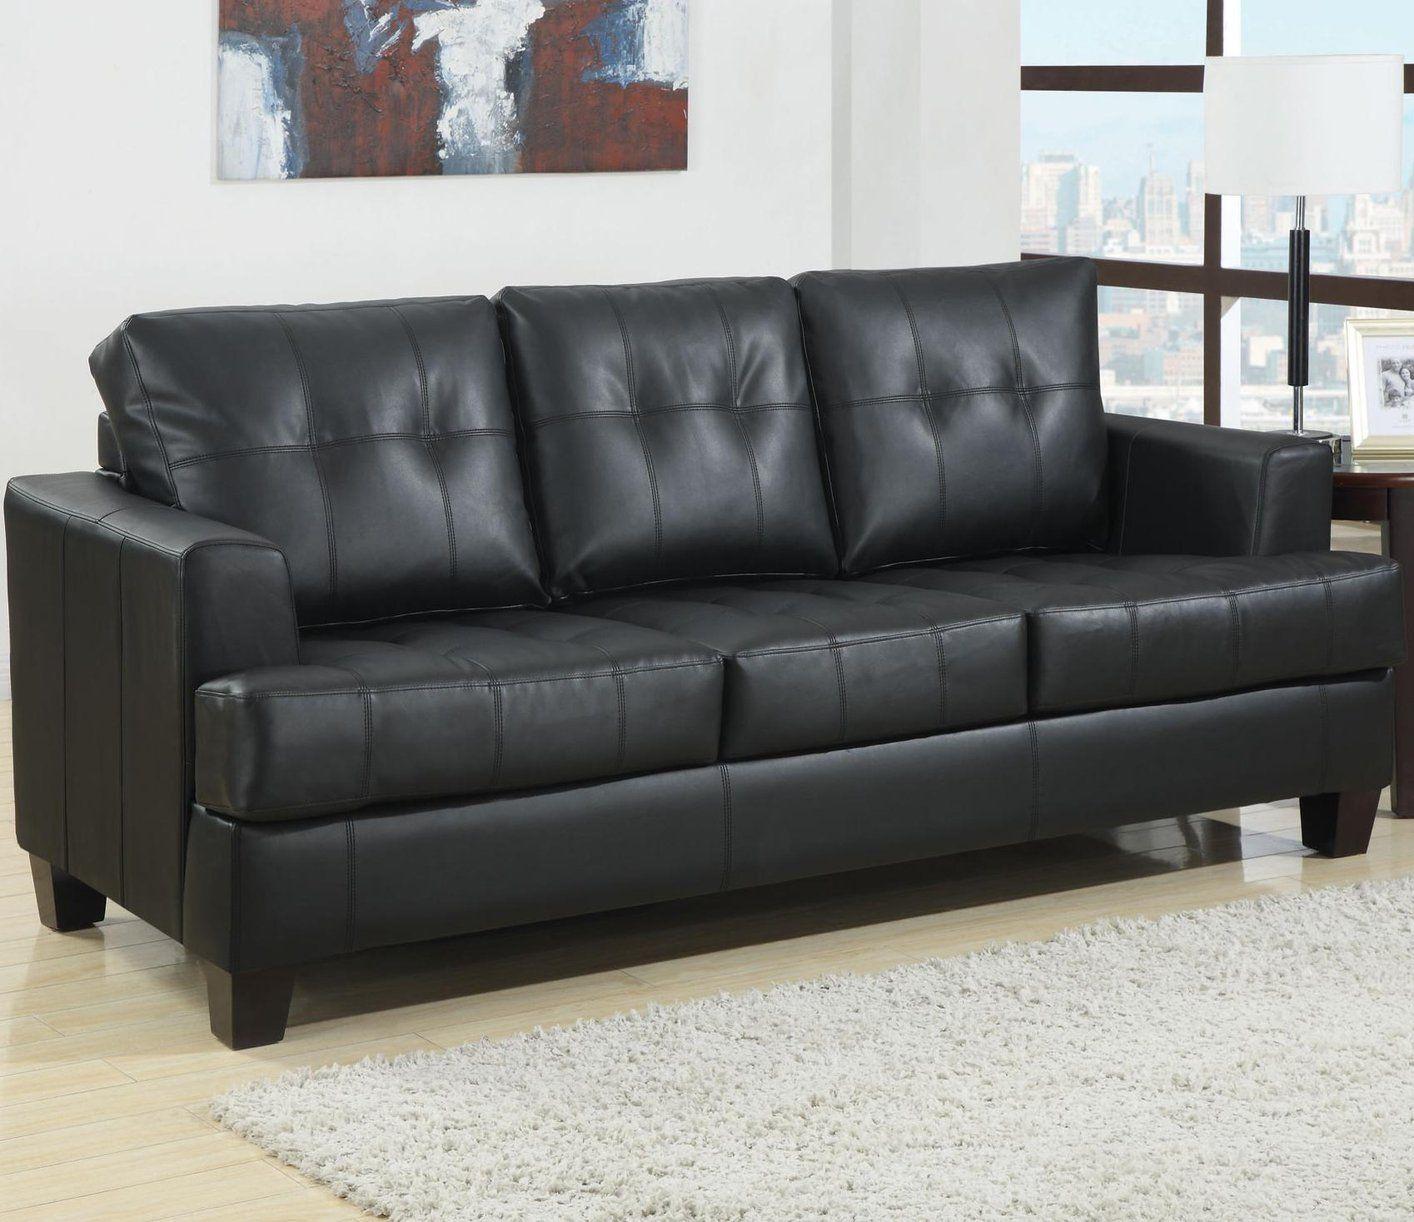 Beautiful Costco Faux Leather Sofa Bed Leather sofa bed